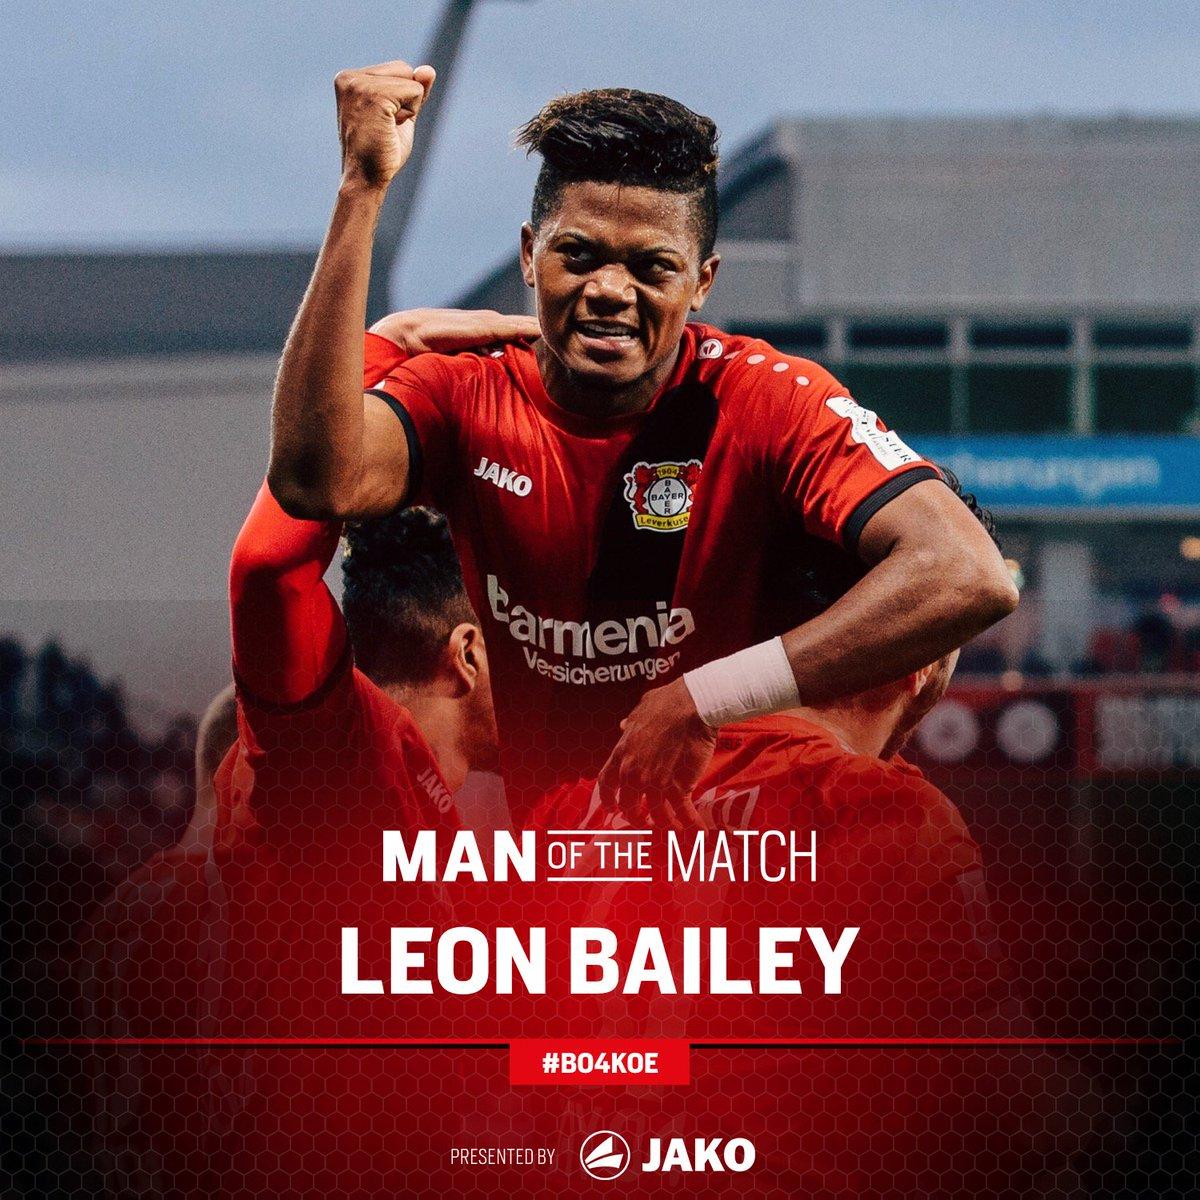 RT @bayer04fussball: .@leonbailey war euer Spieler des Derbys! 💪   #B04KOE https://t.co/TPbeAjGGba